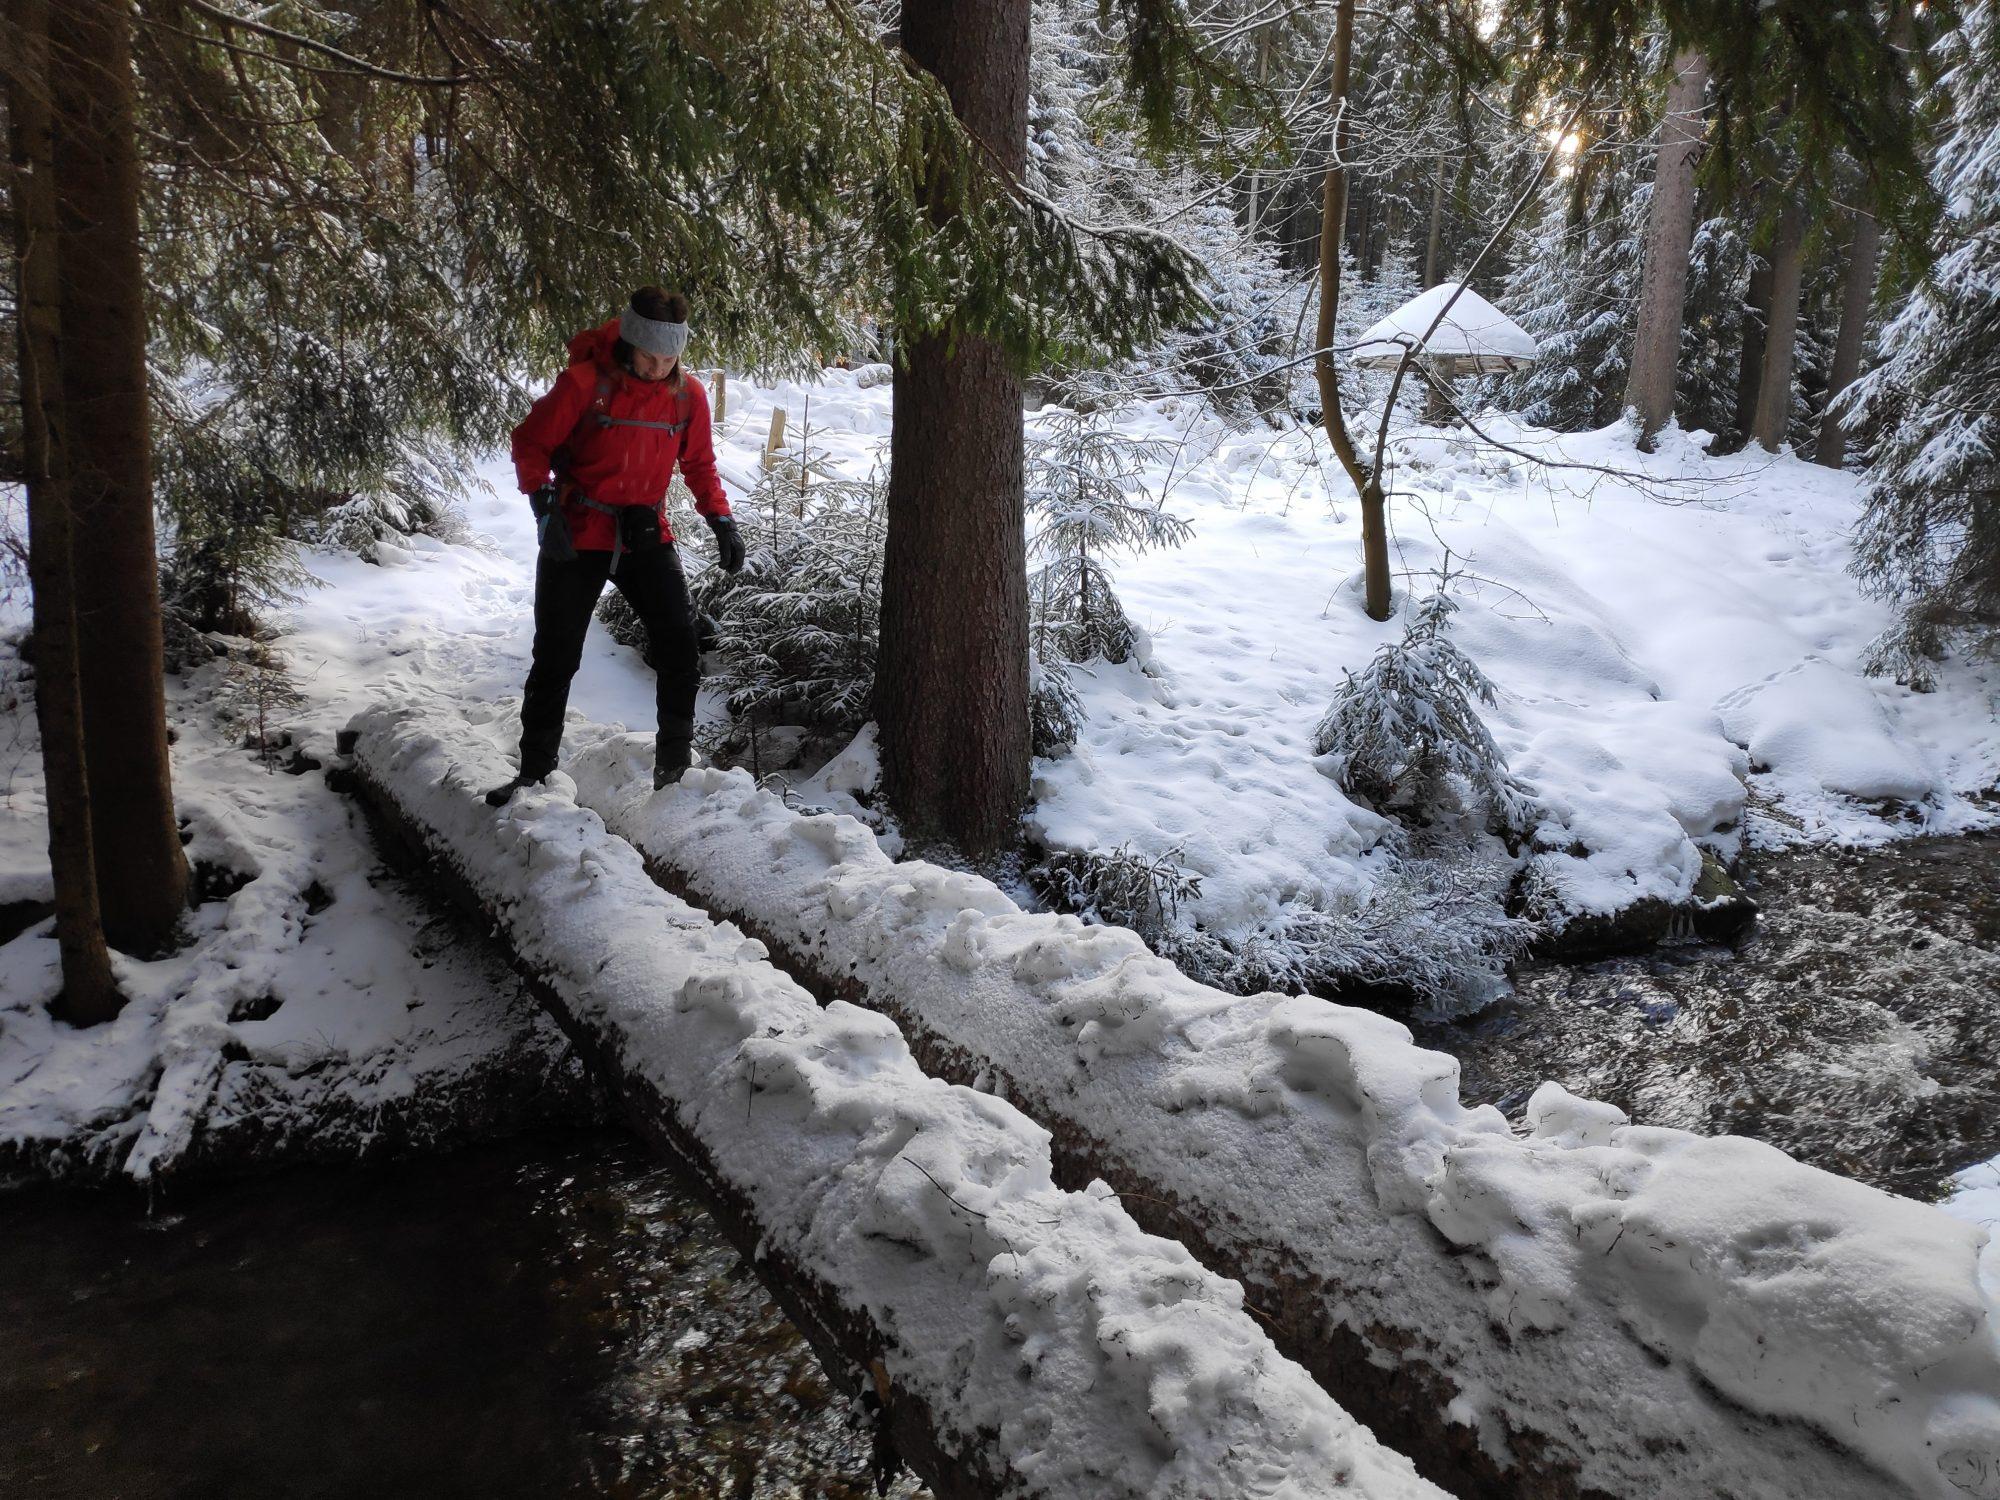 Flußüberquerung beim Winterwandern im Vogtland, Felsenweg, Grünbach